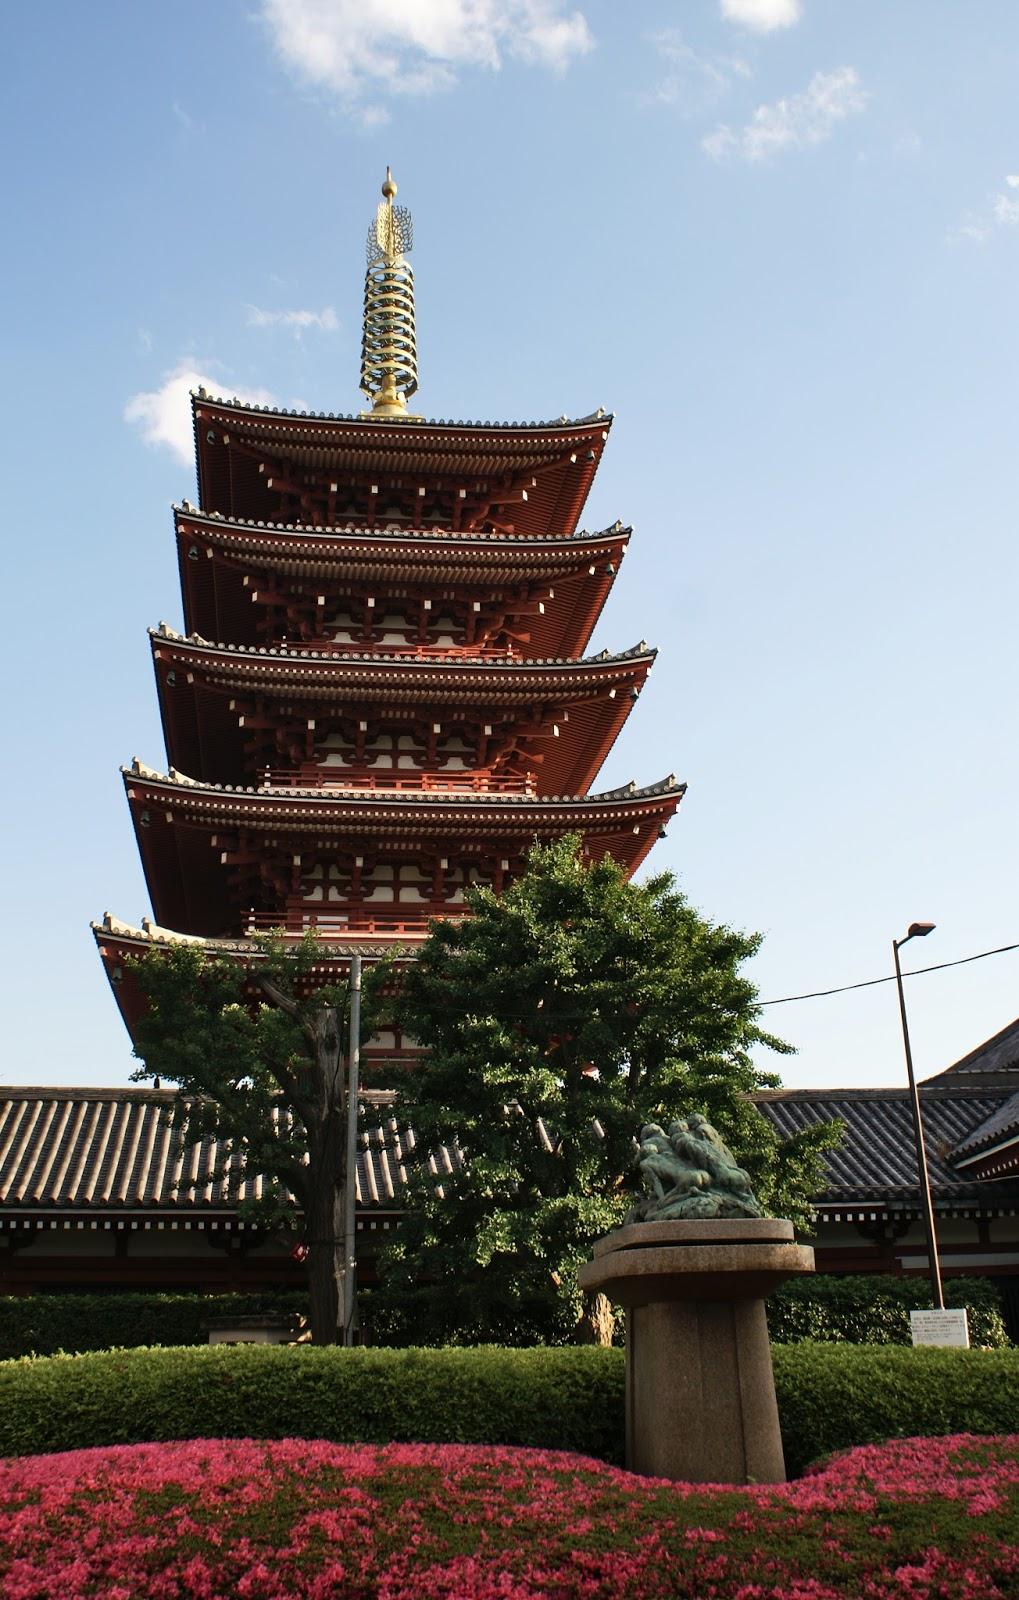 asakusa senso-ji pagoda tokyo japan